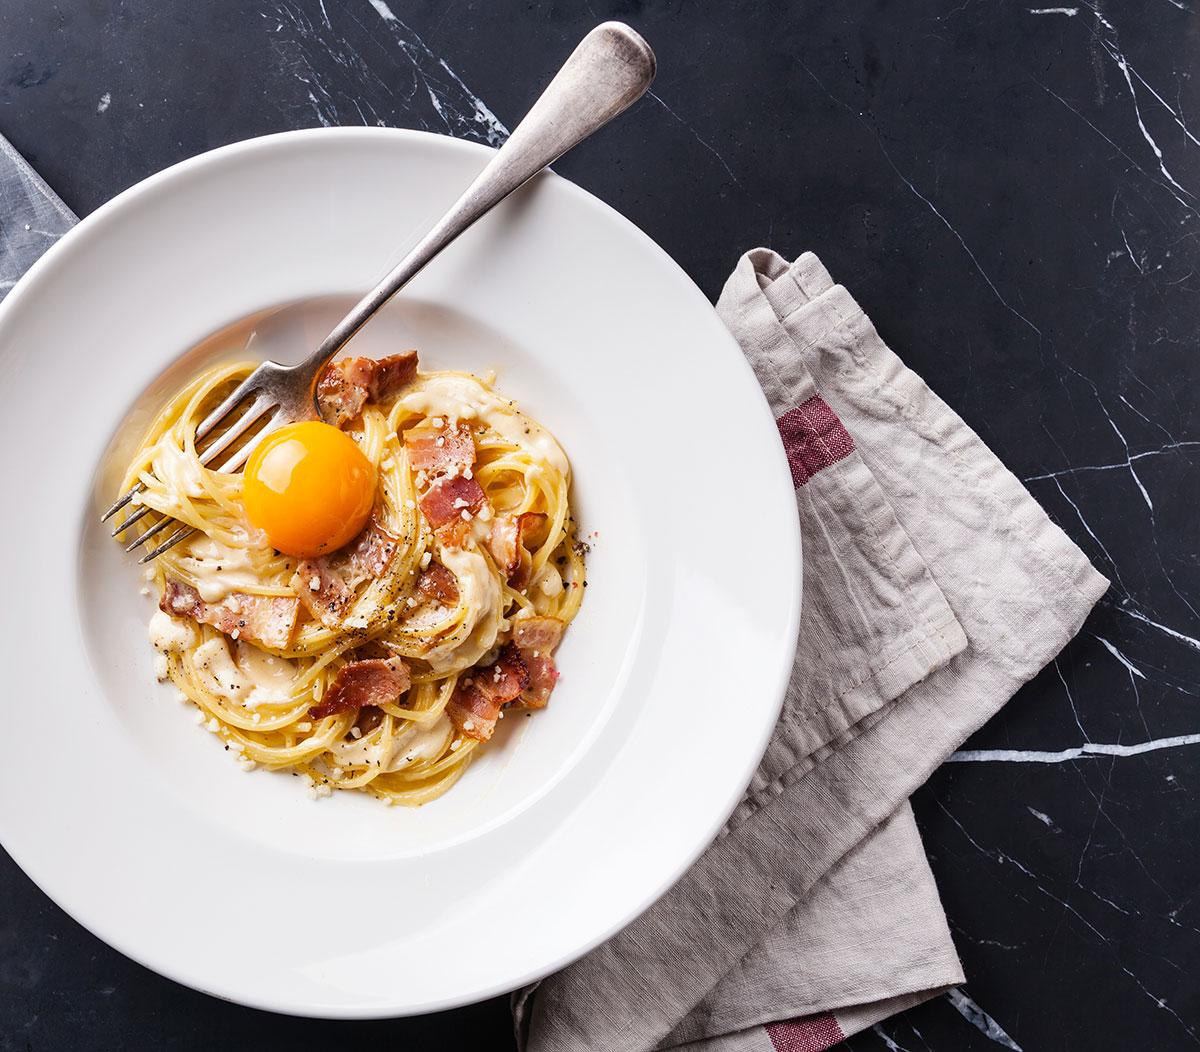 recette de spaghettinis la carbonara selon bob le chef. Black Bedroom Furniture Sets. Home Design Ideas